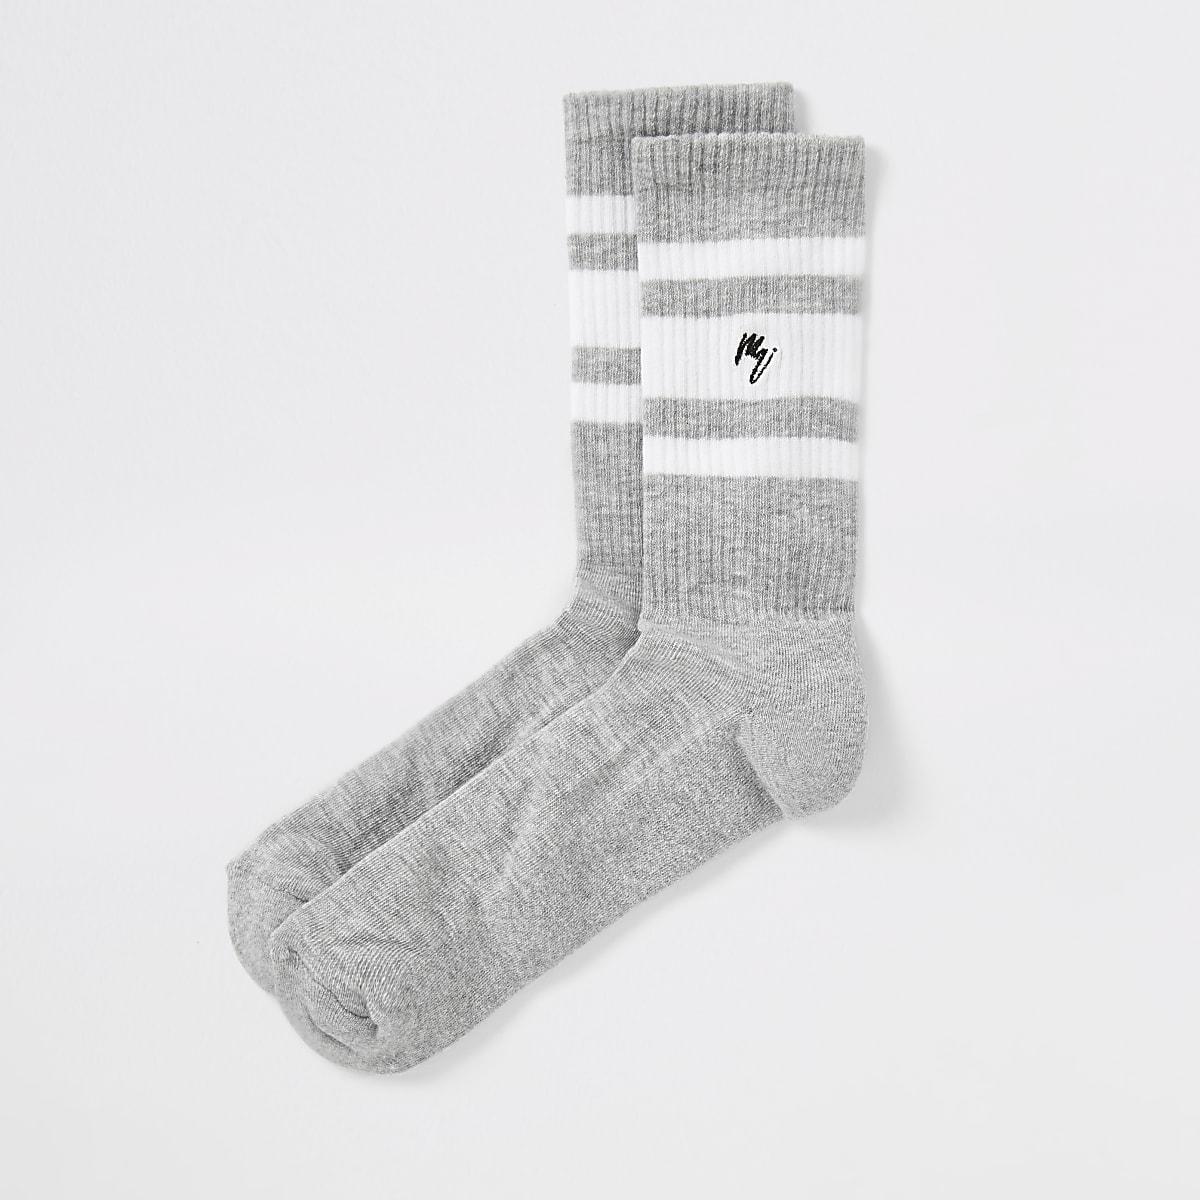 Maison Riviera - Grijze gestreepte sokken